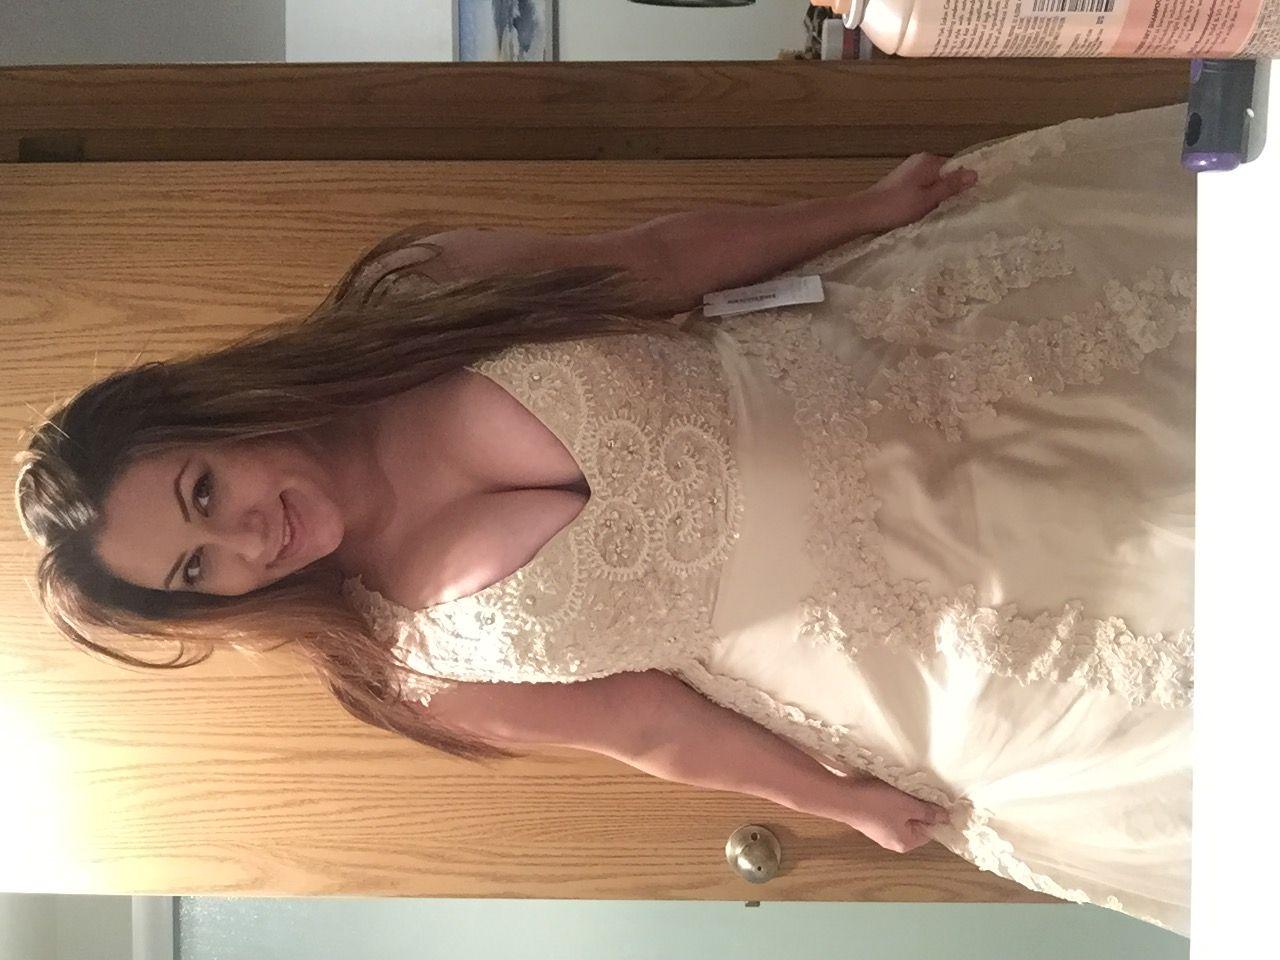 A linie princess linie v ausschnitt hof schleppe t ll for Where can i get my wedding dress steamed